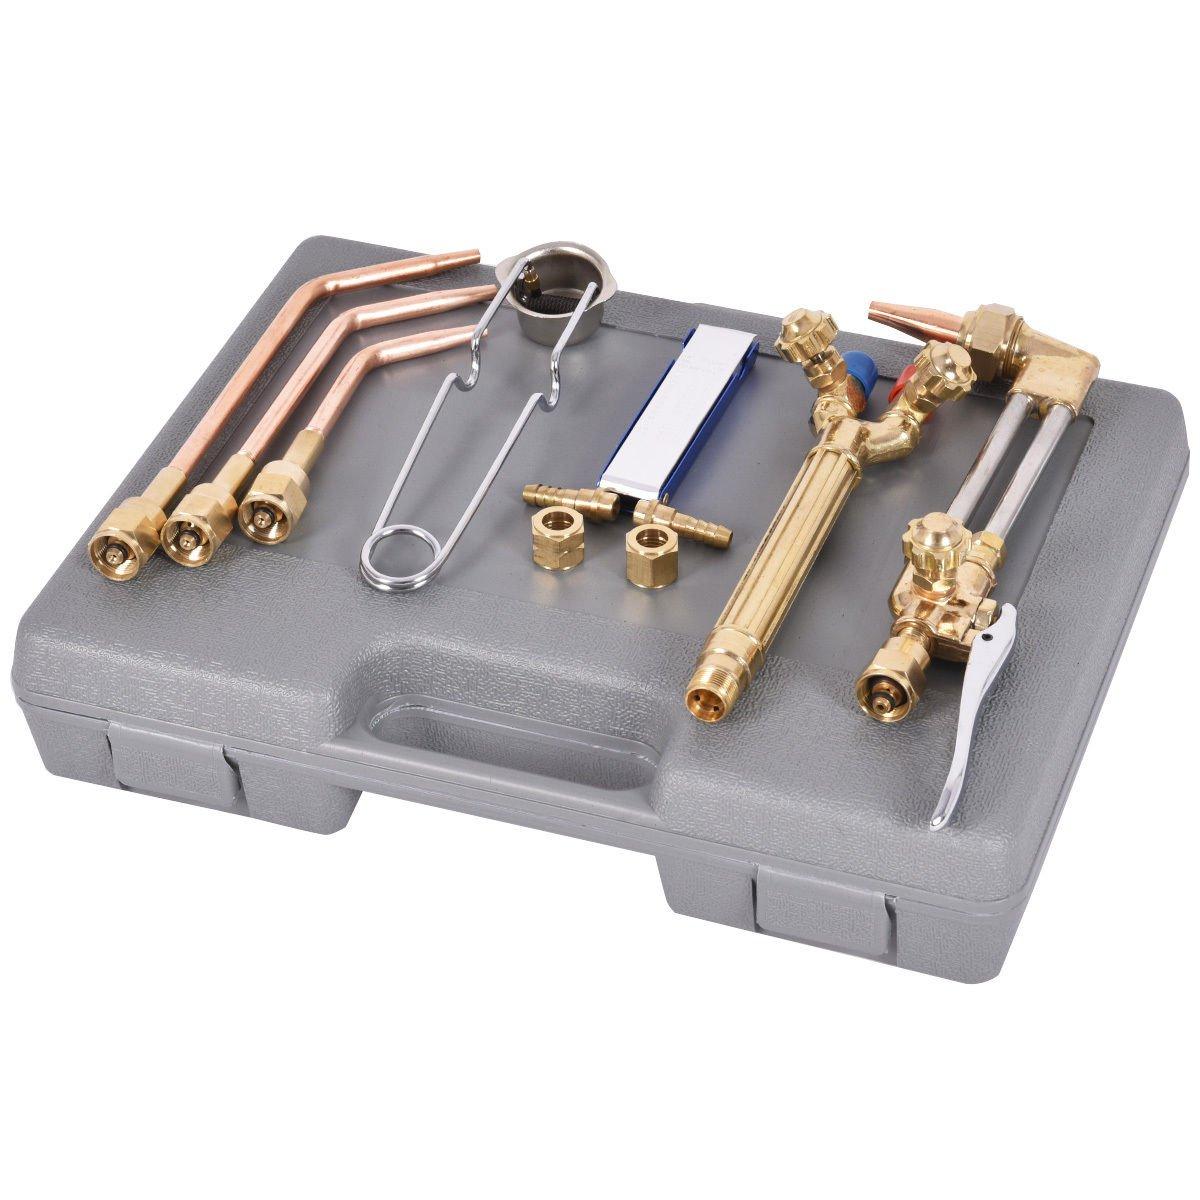 NEW 10 PCS Gas Welding & Cutting Kit Oxygen Torch Acetylene Welder Tool Set with Case by Jikkolumlukka